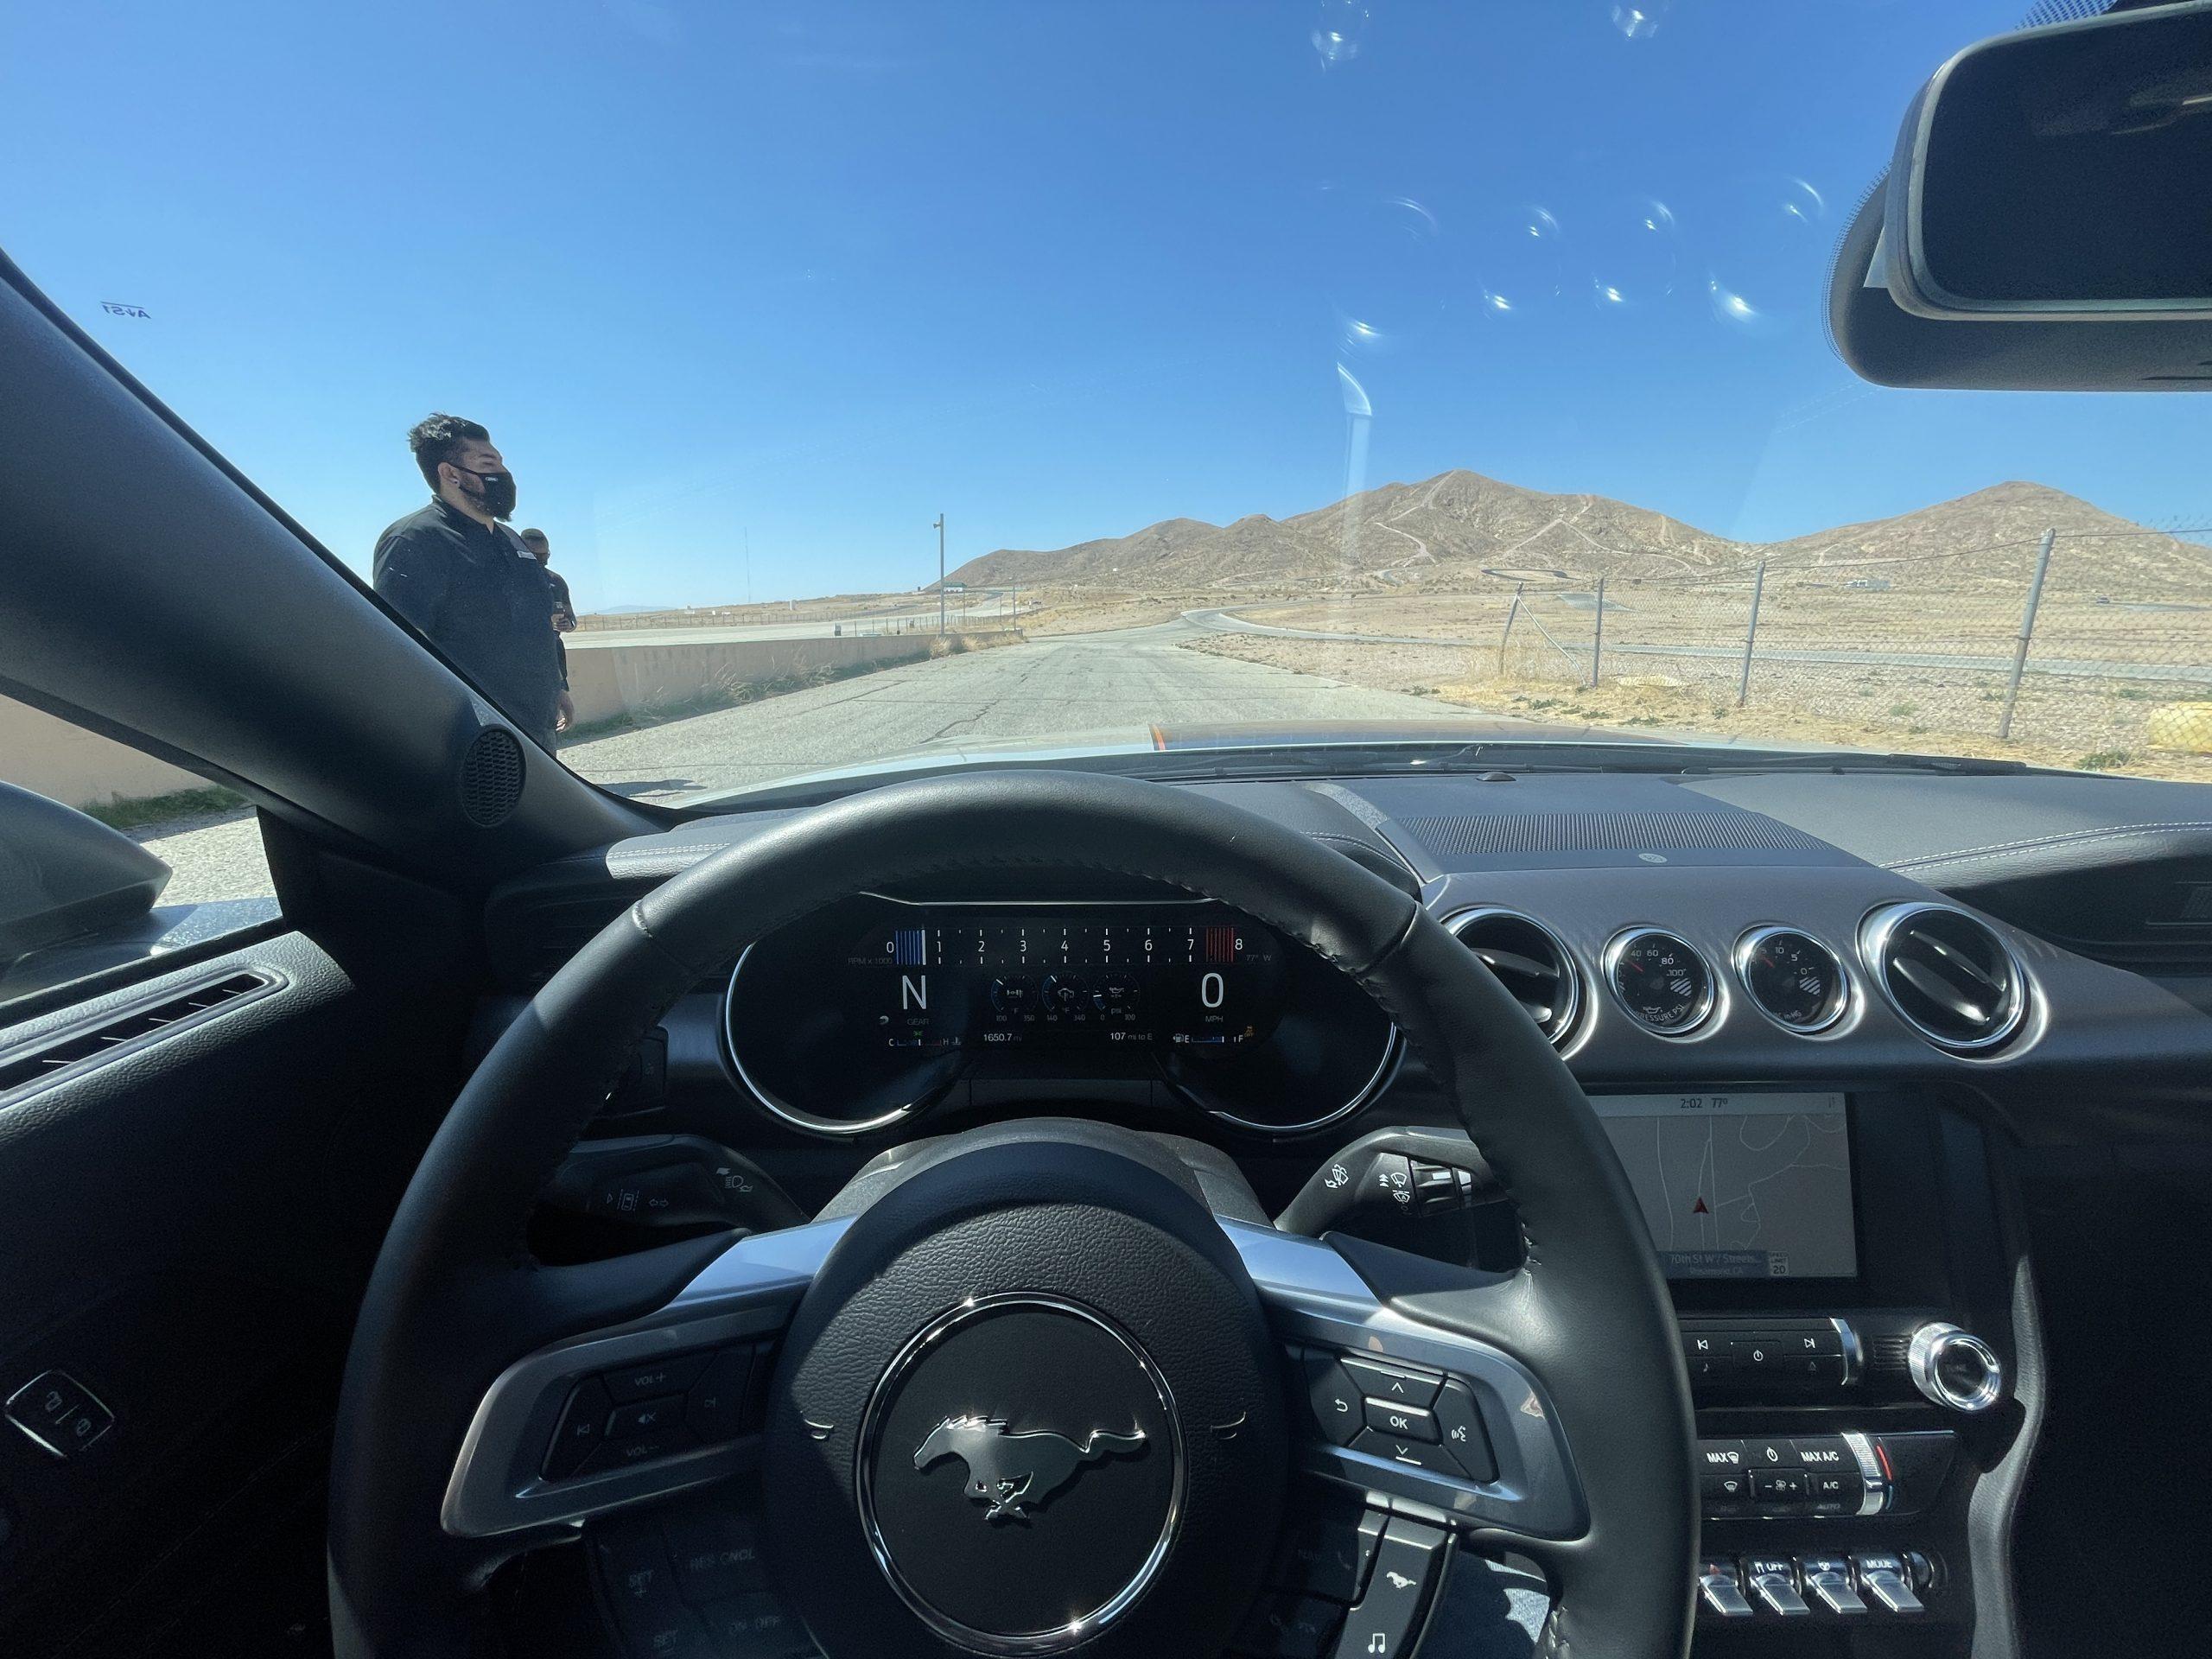 New Mustang Mach 1 interior driver cockpit